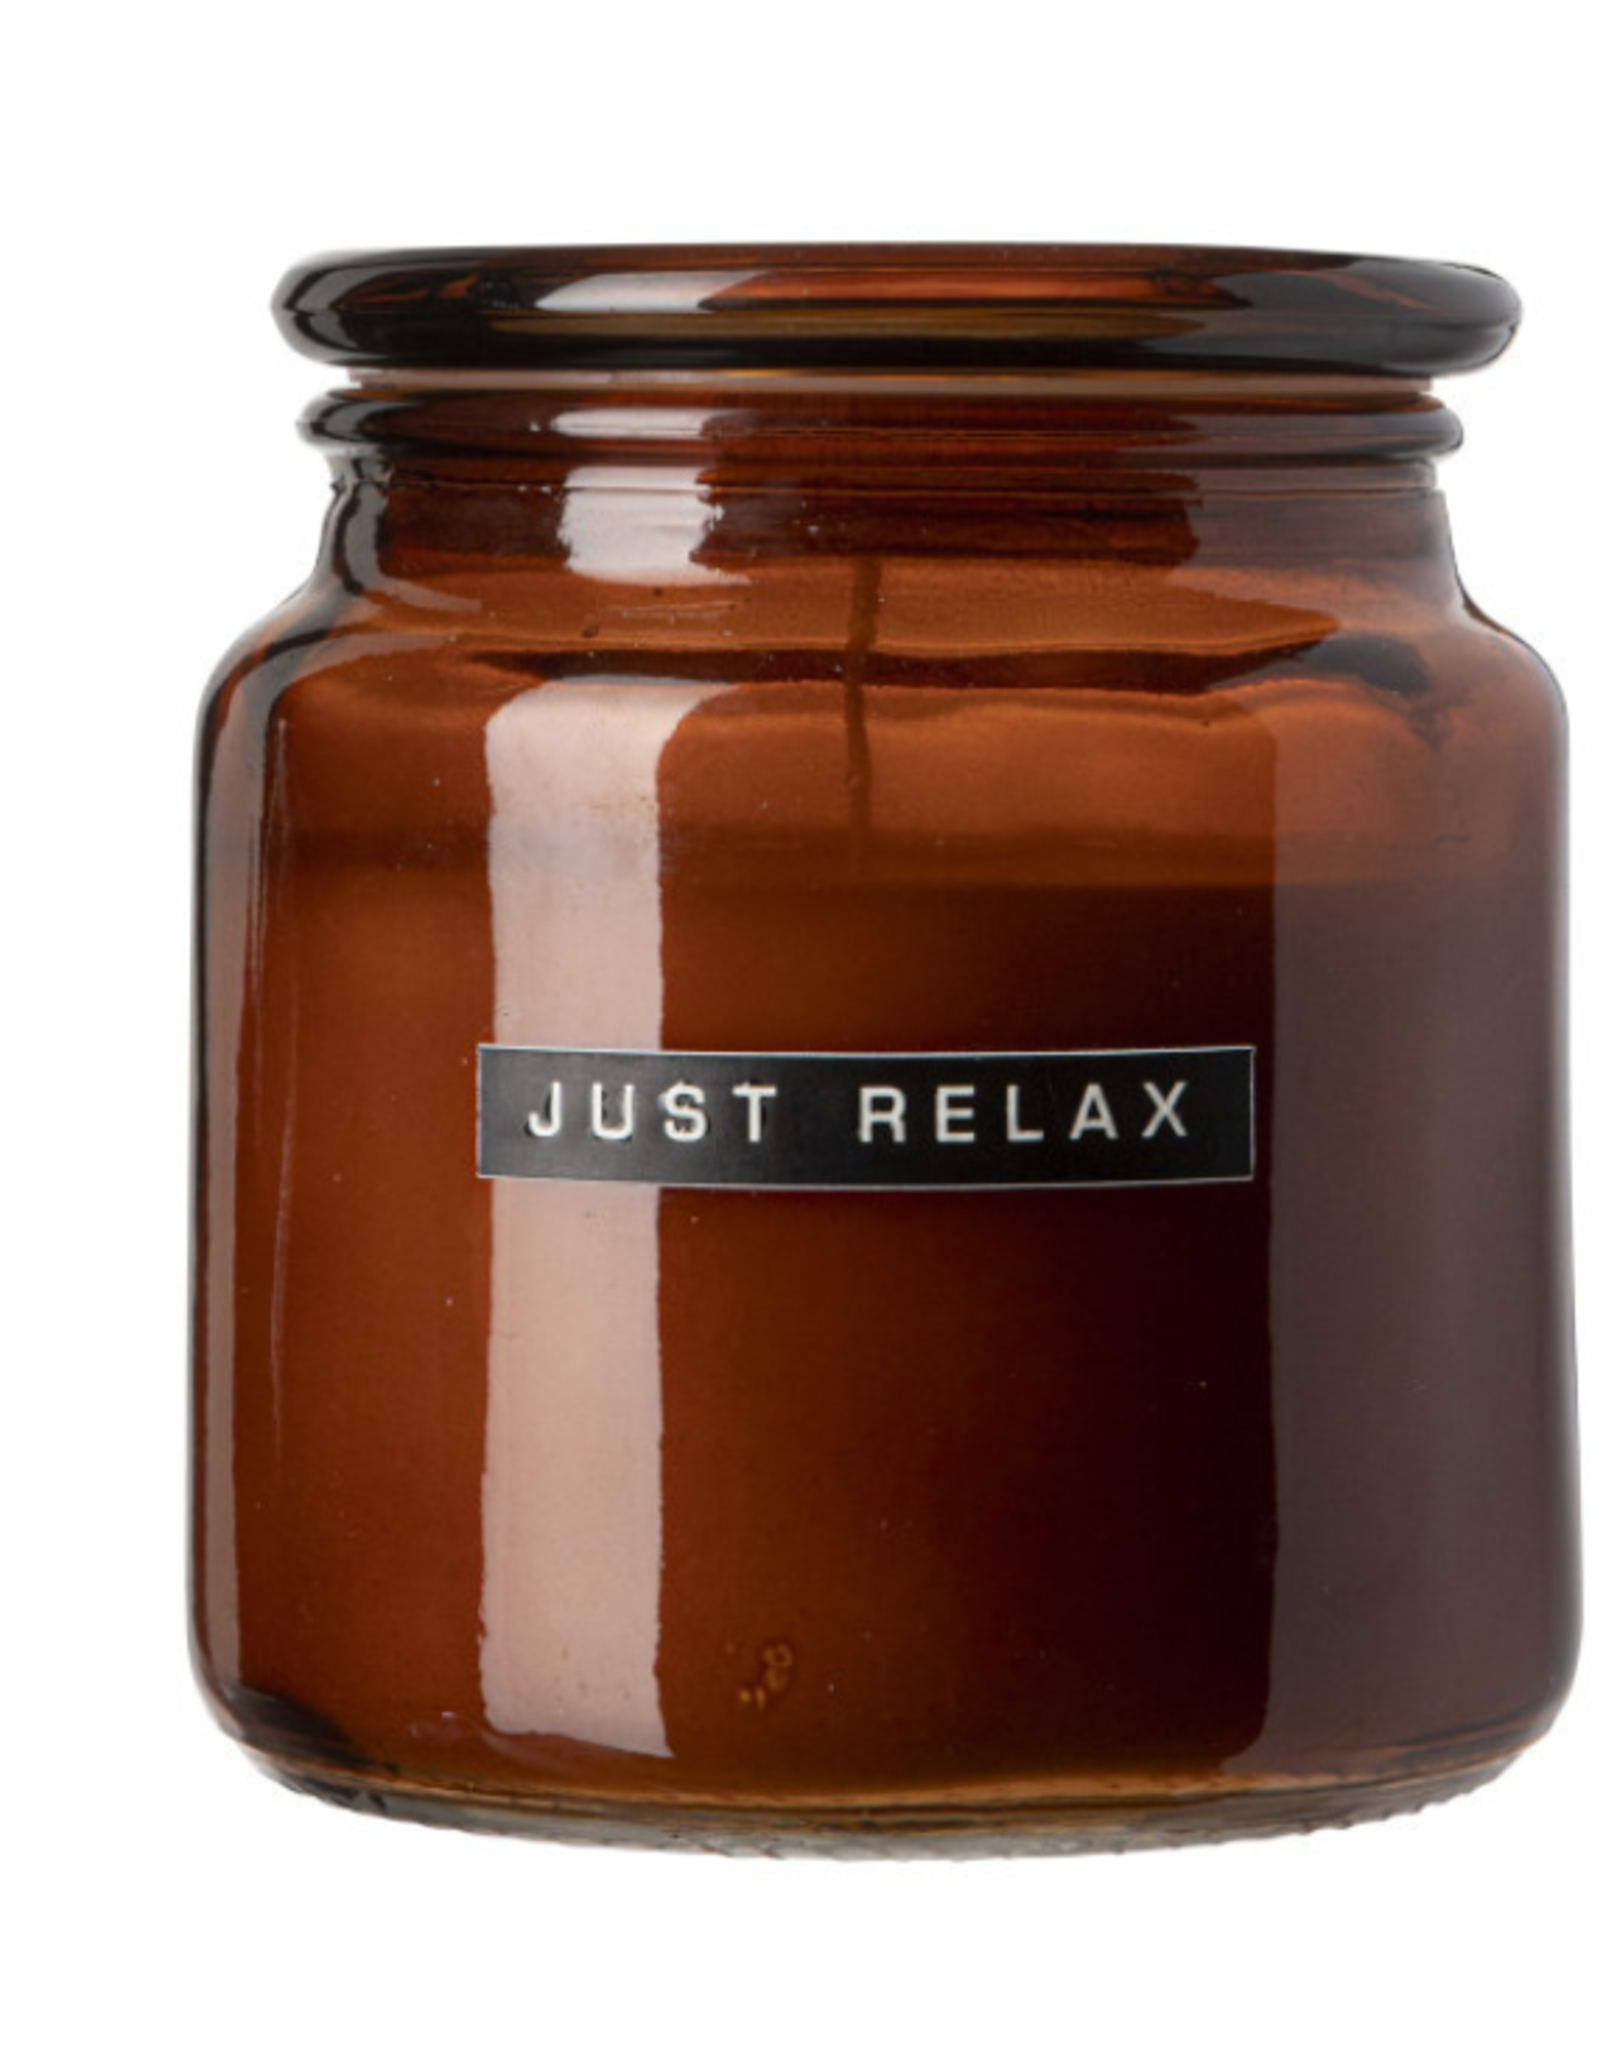 Wellmark Wellmark - Grote geurkaars 500ml - cedarwood - bruin glas - Just Relax